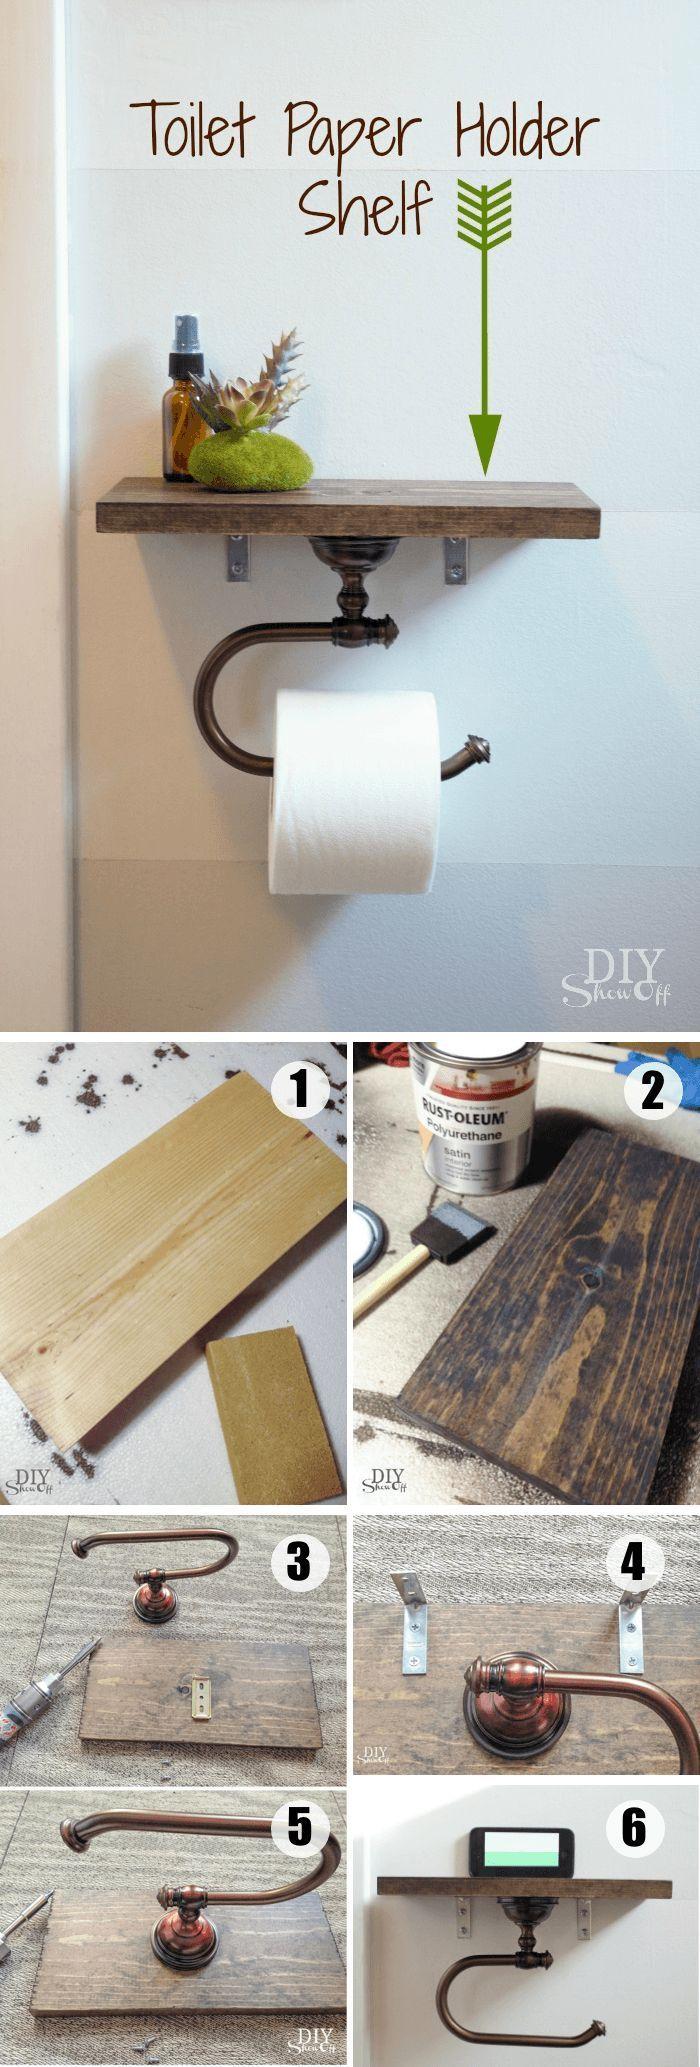 15 Totally Unusual Diy Toilet Paper Holders Homelovr Diy Toilet Paper Holder Rustic Bathroom Decor Toilet Paper Holder Shelf